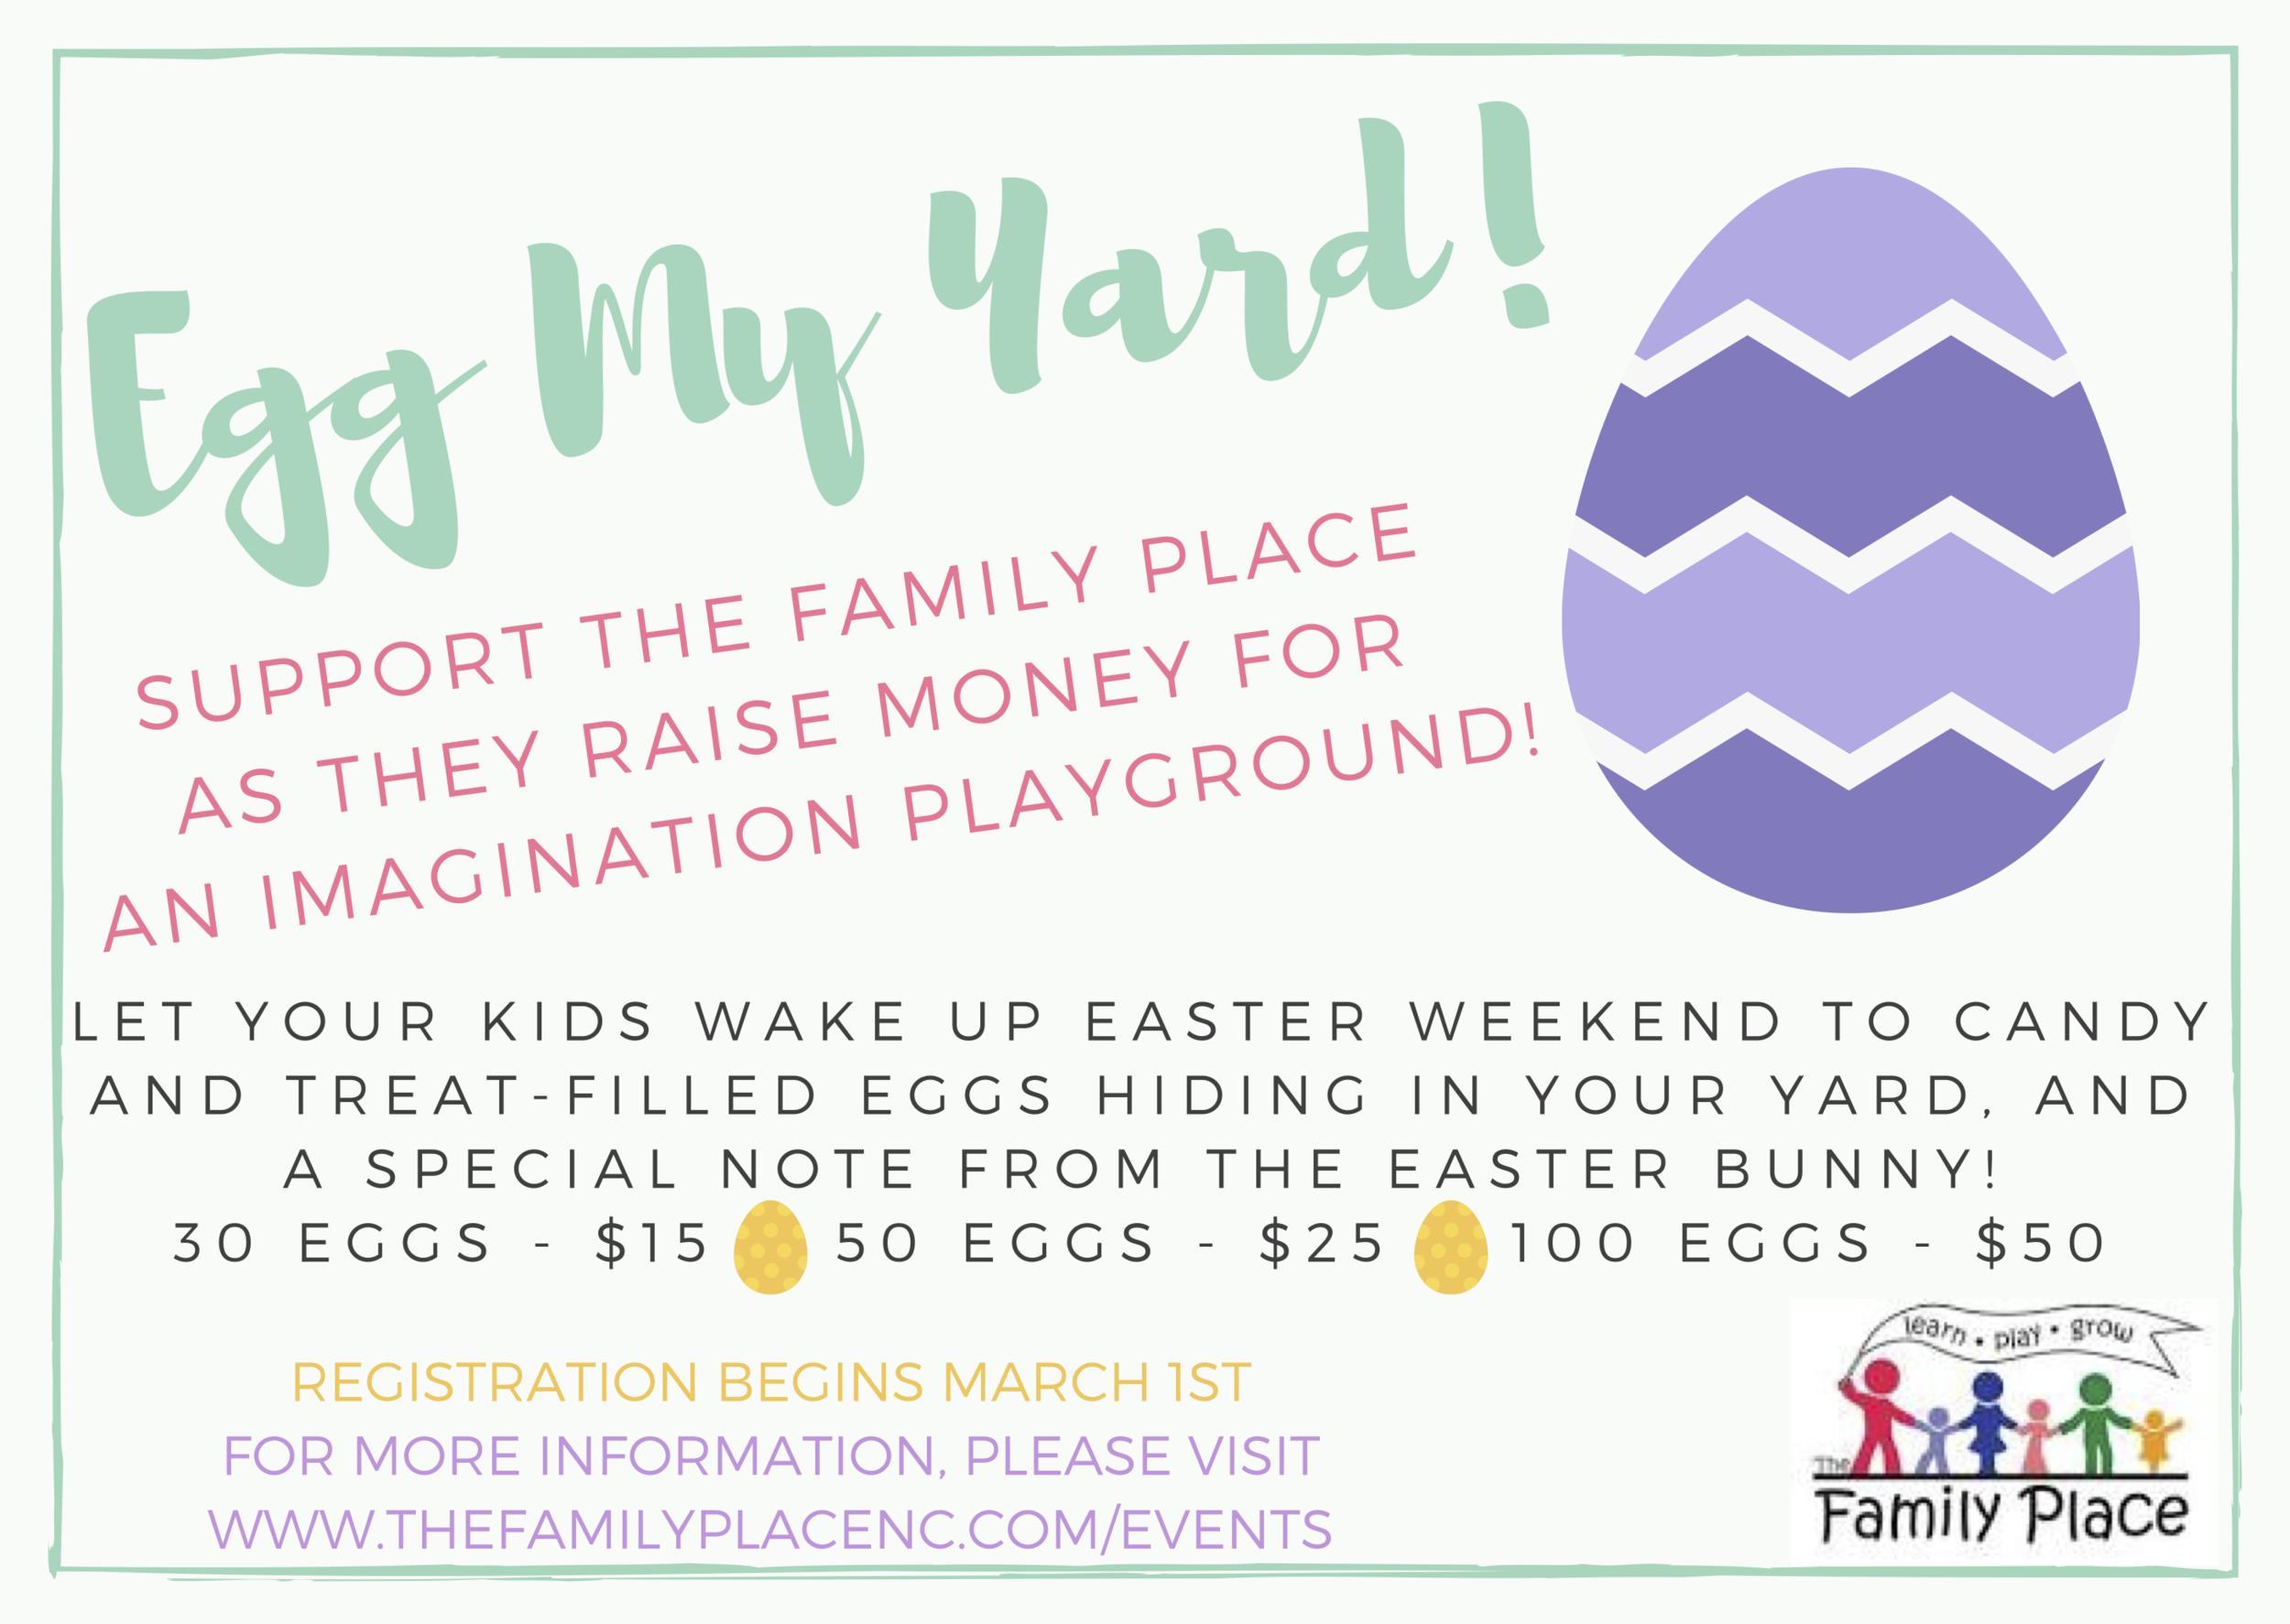 Egg My Yard - Final.png